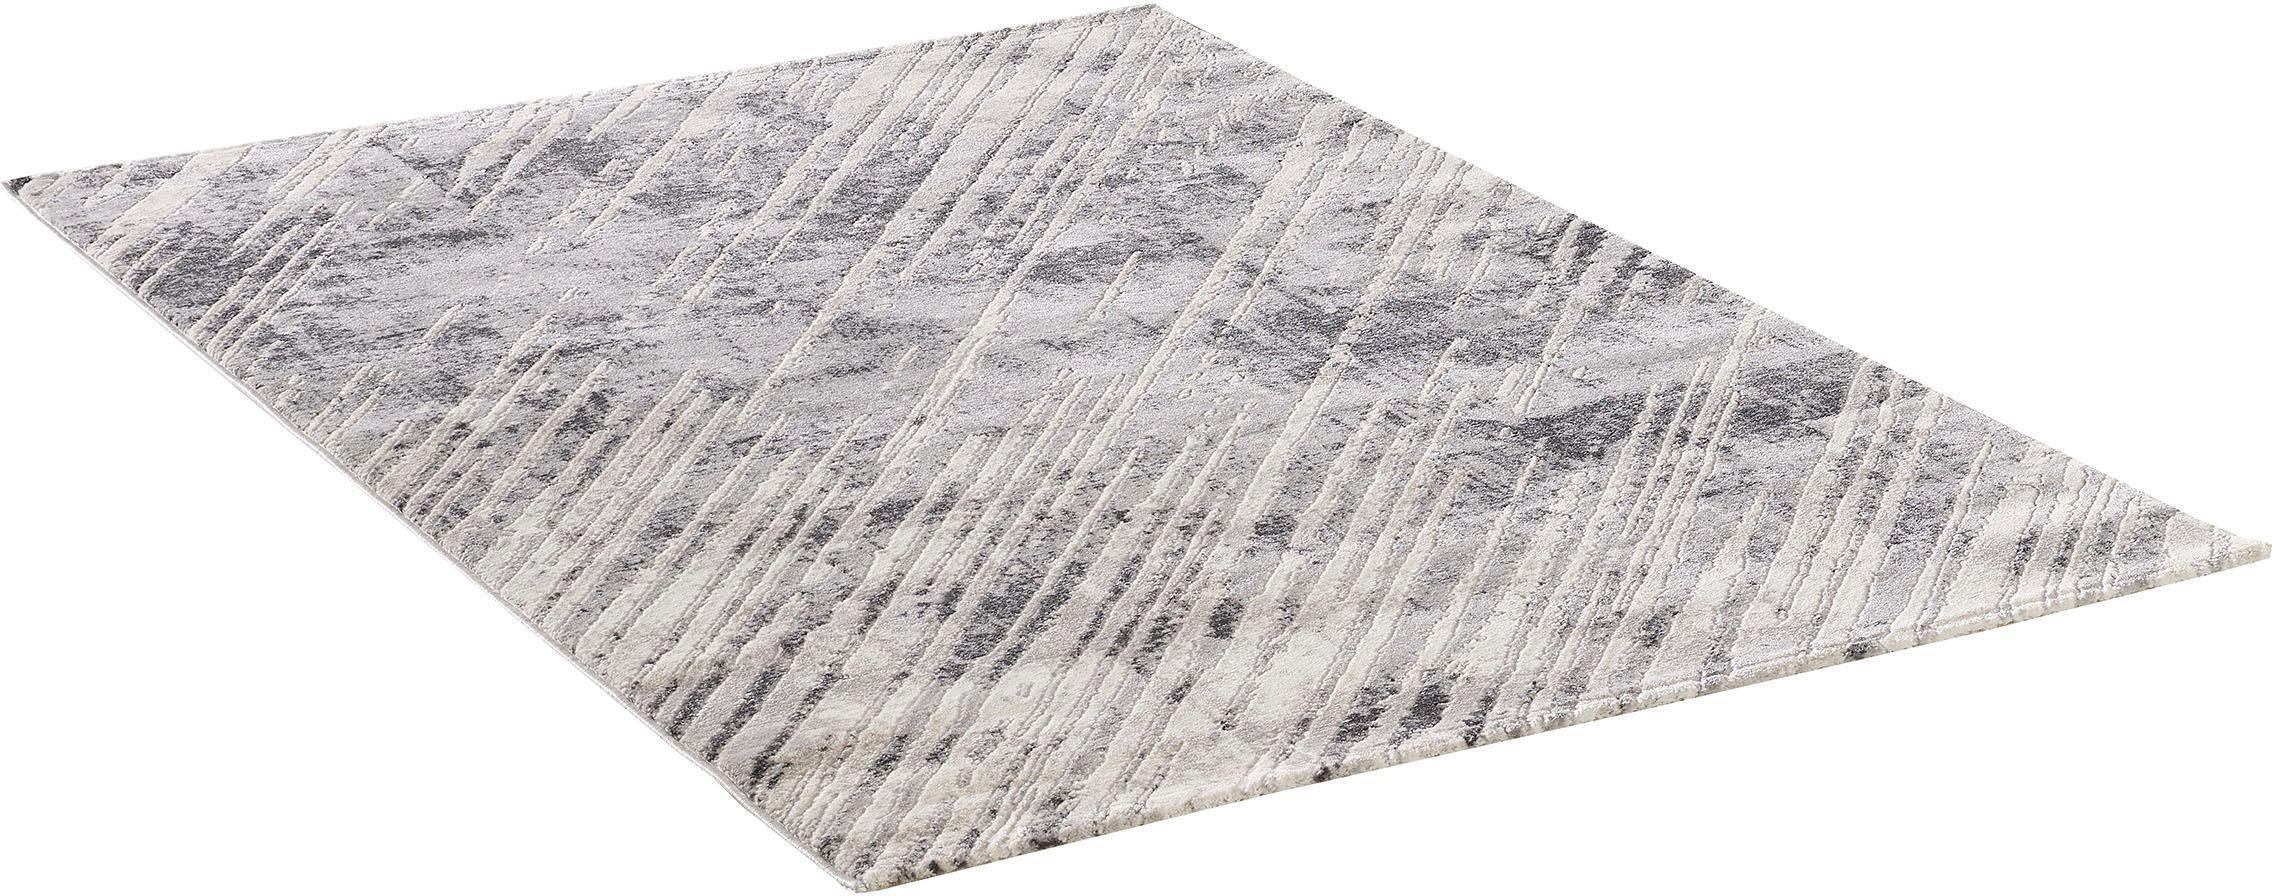 Teppich Harmony 3208 Sanat Teppiche rechteckig Höhe 12 mm maschinell gewebt